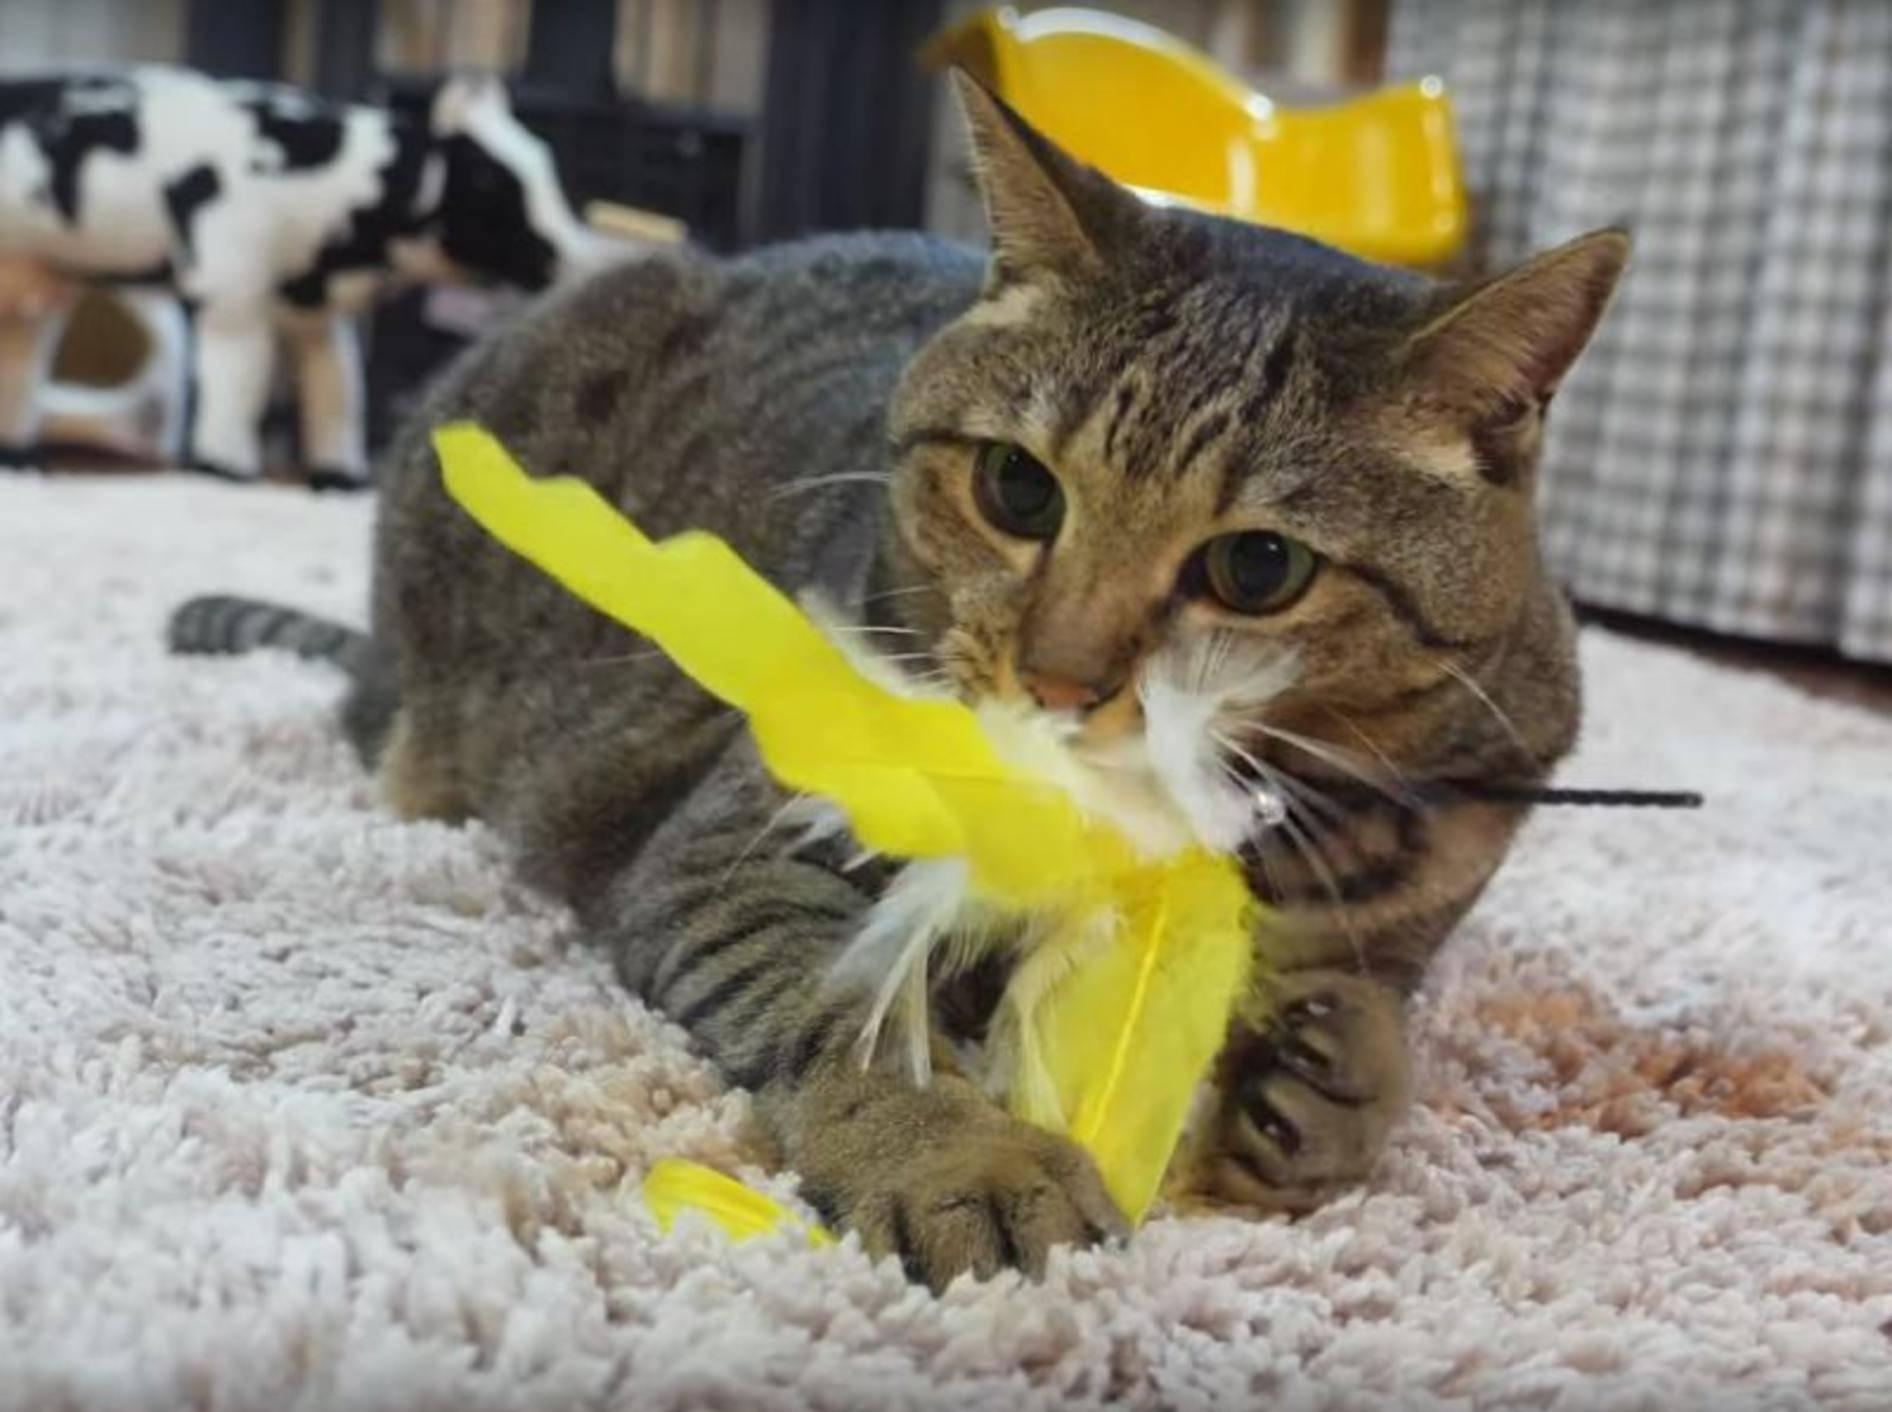 Katze Hana auf der Jagd nach dem Federspielzeug – YouTube / mugumogu